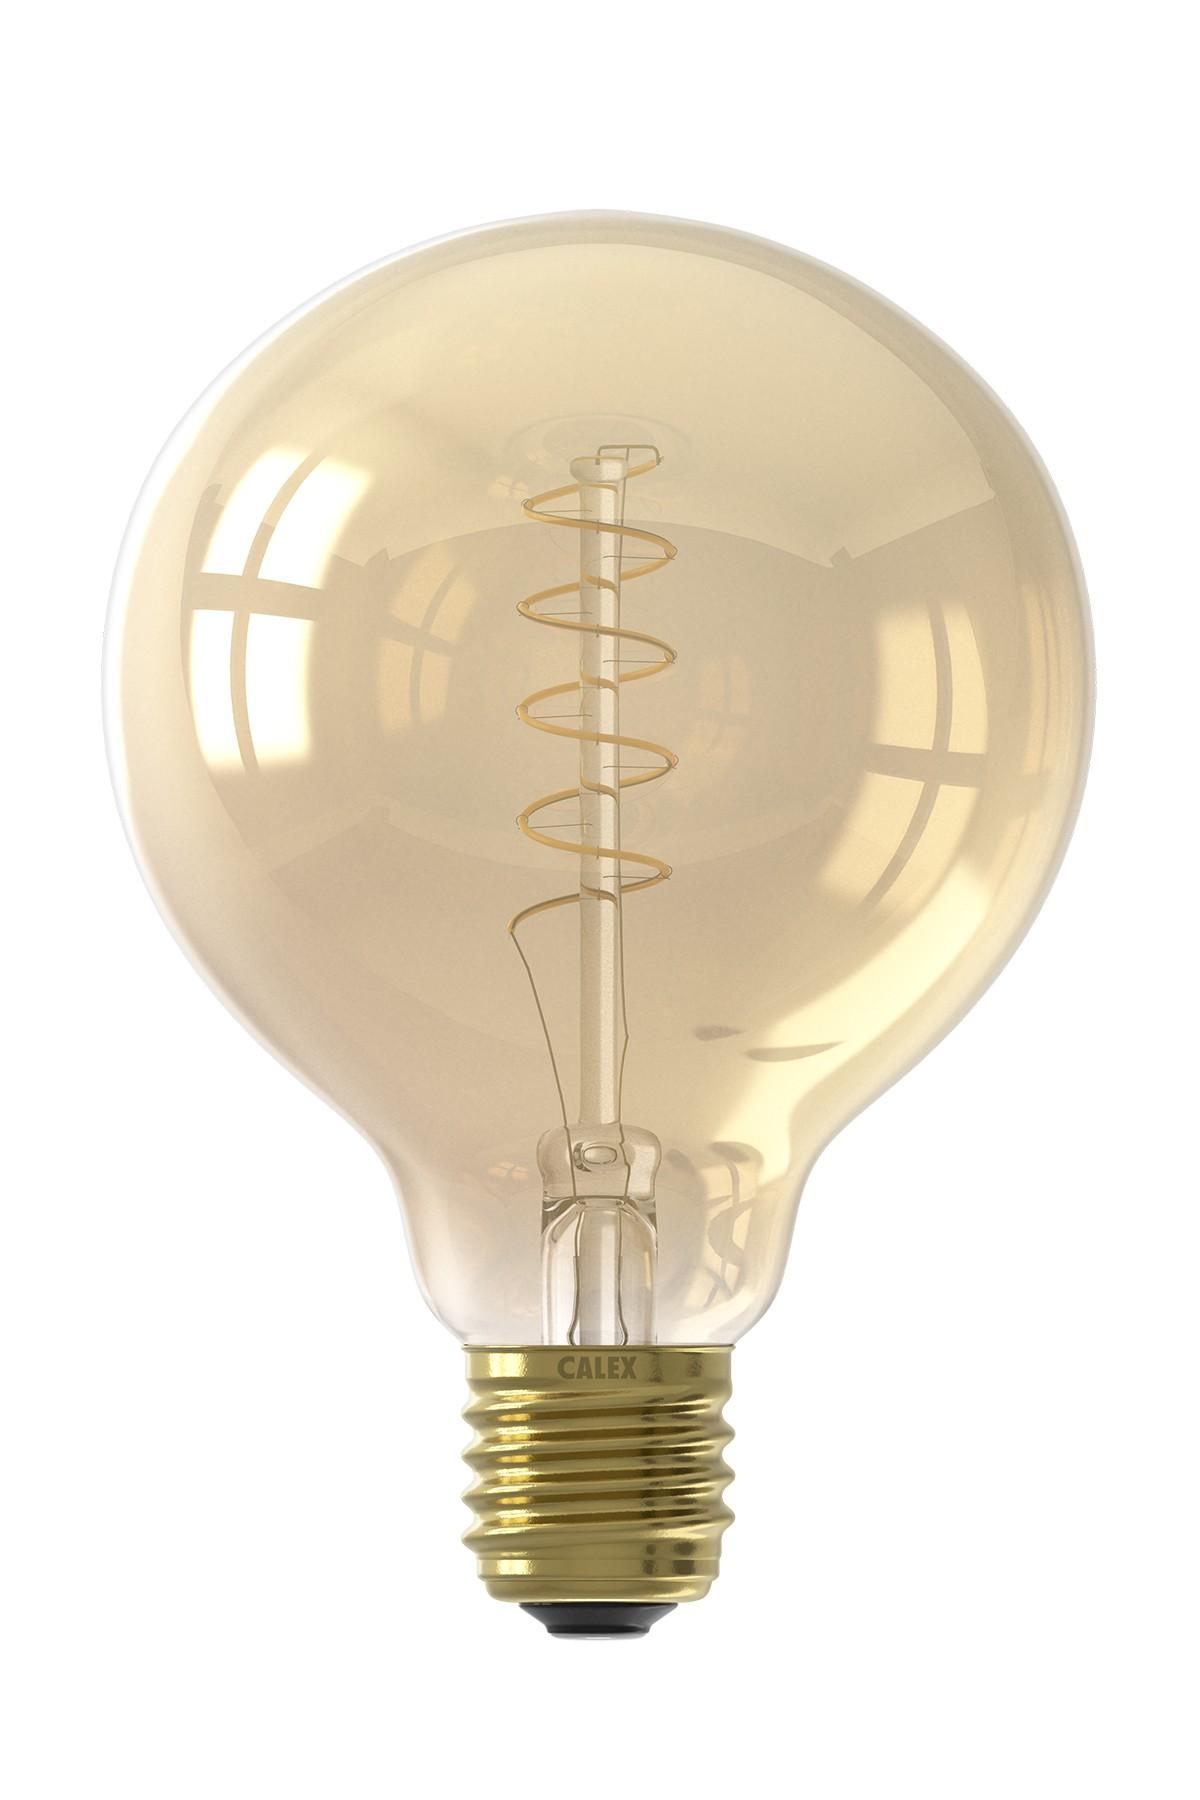 Calex Led Full Glass Flex Filament Globe Lamp 240v 4w 200lm E27 G95